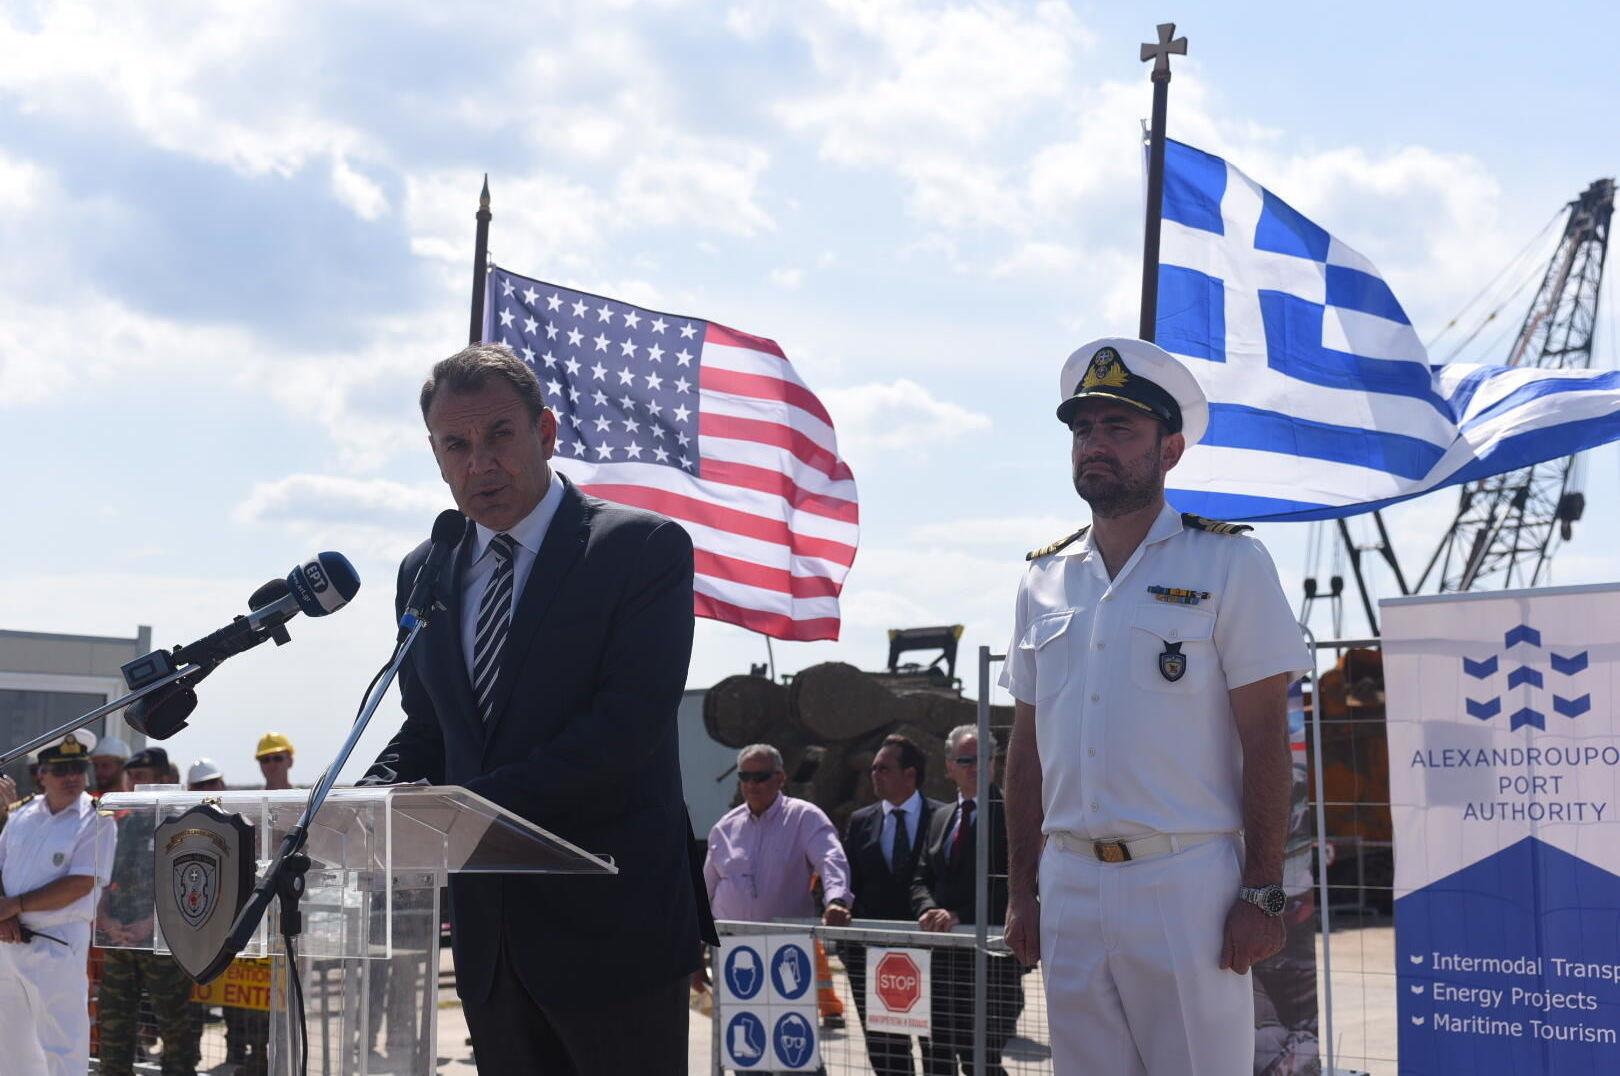 Ministro da Defesa Nacional da Grécia Nikolaos Panagiatopoulos no porto de Alexandrópolis, na Grécia